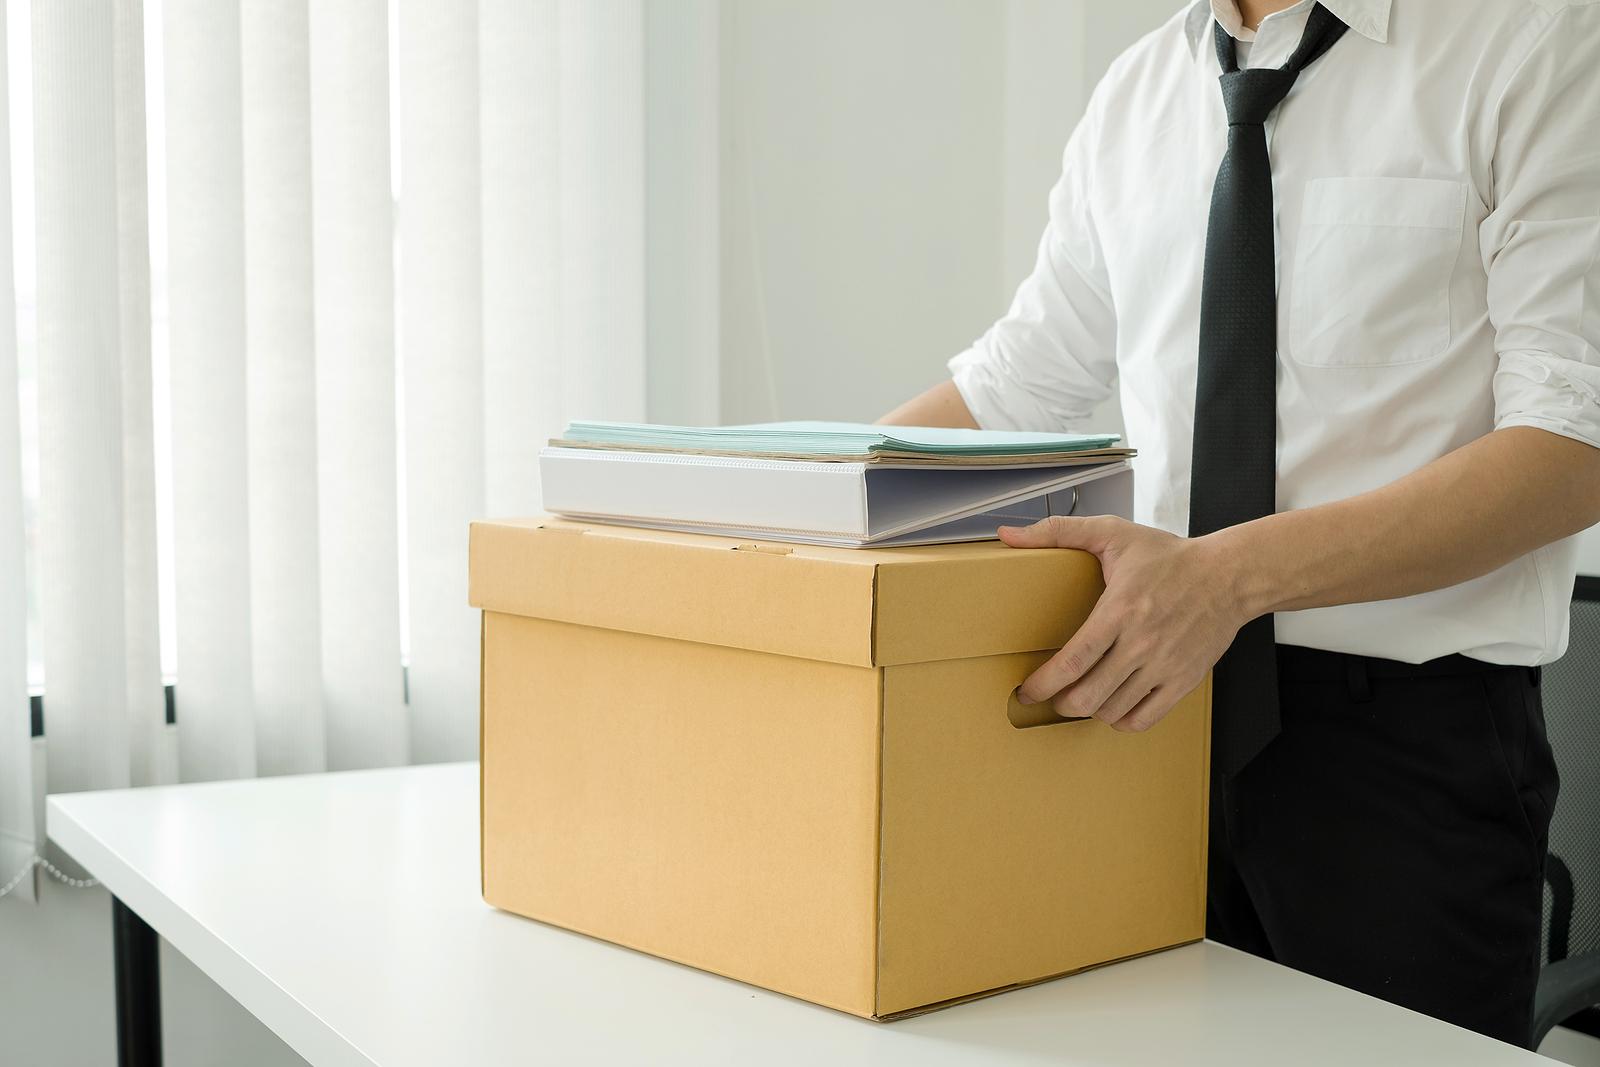 Key Ways to Best Handle Large-Scale Staff Layoffs